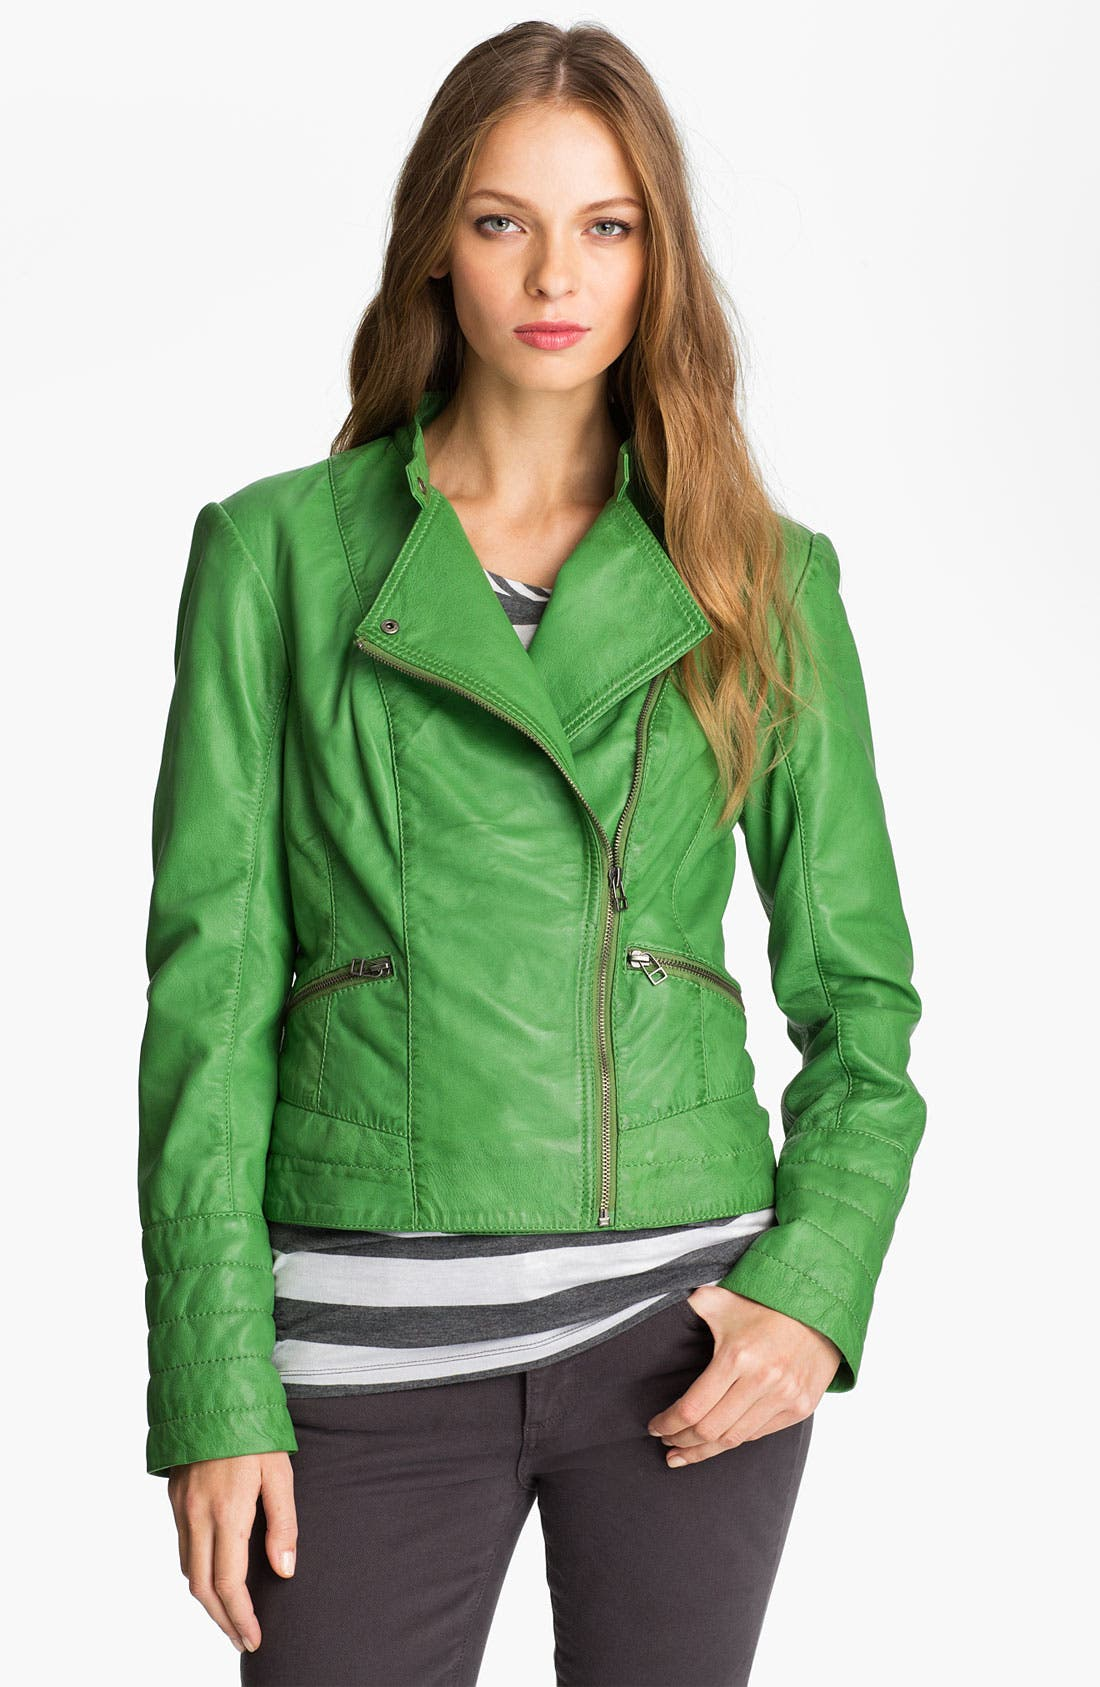 Alternate Image 1 Selected - Bernardo Leather Moto Jacket (Regular & Petite) (Nordstrom Exclusive)